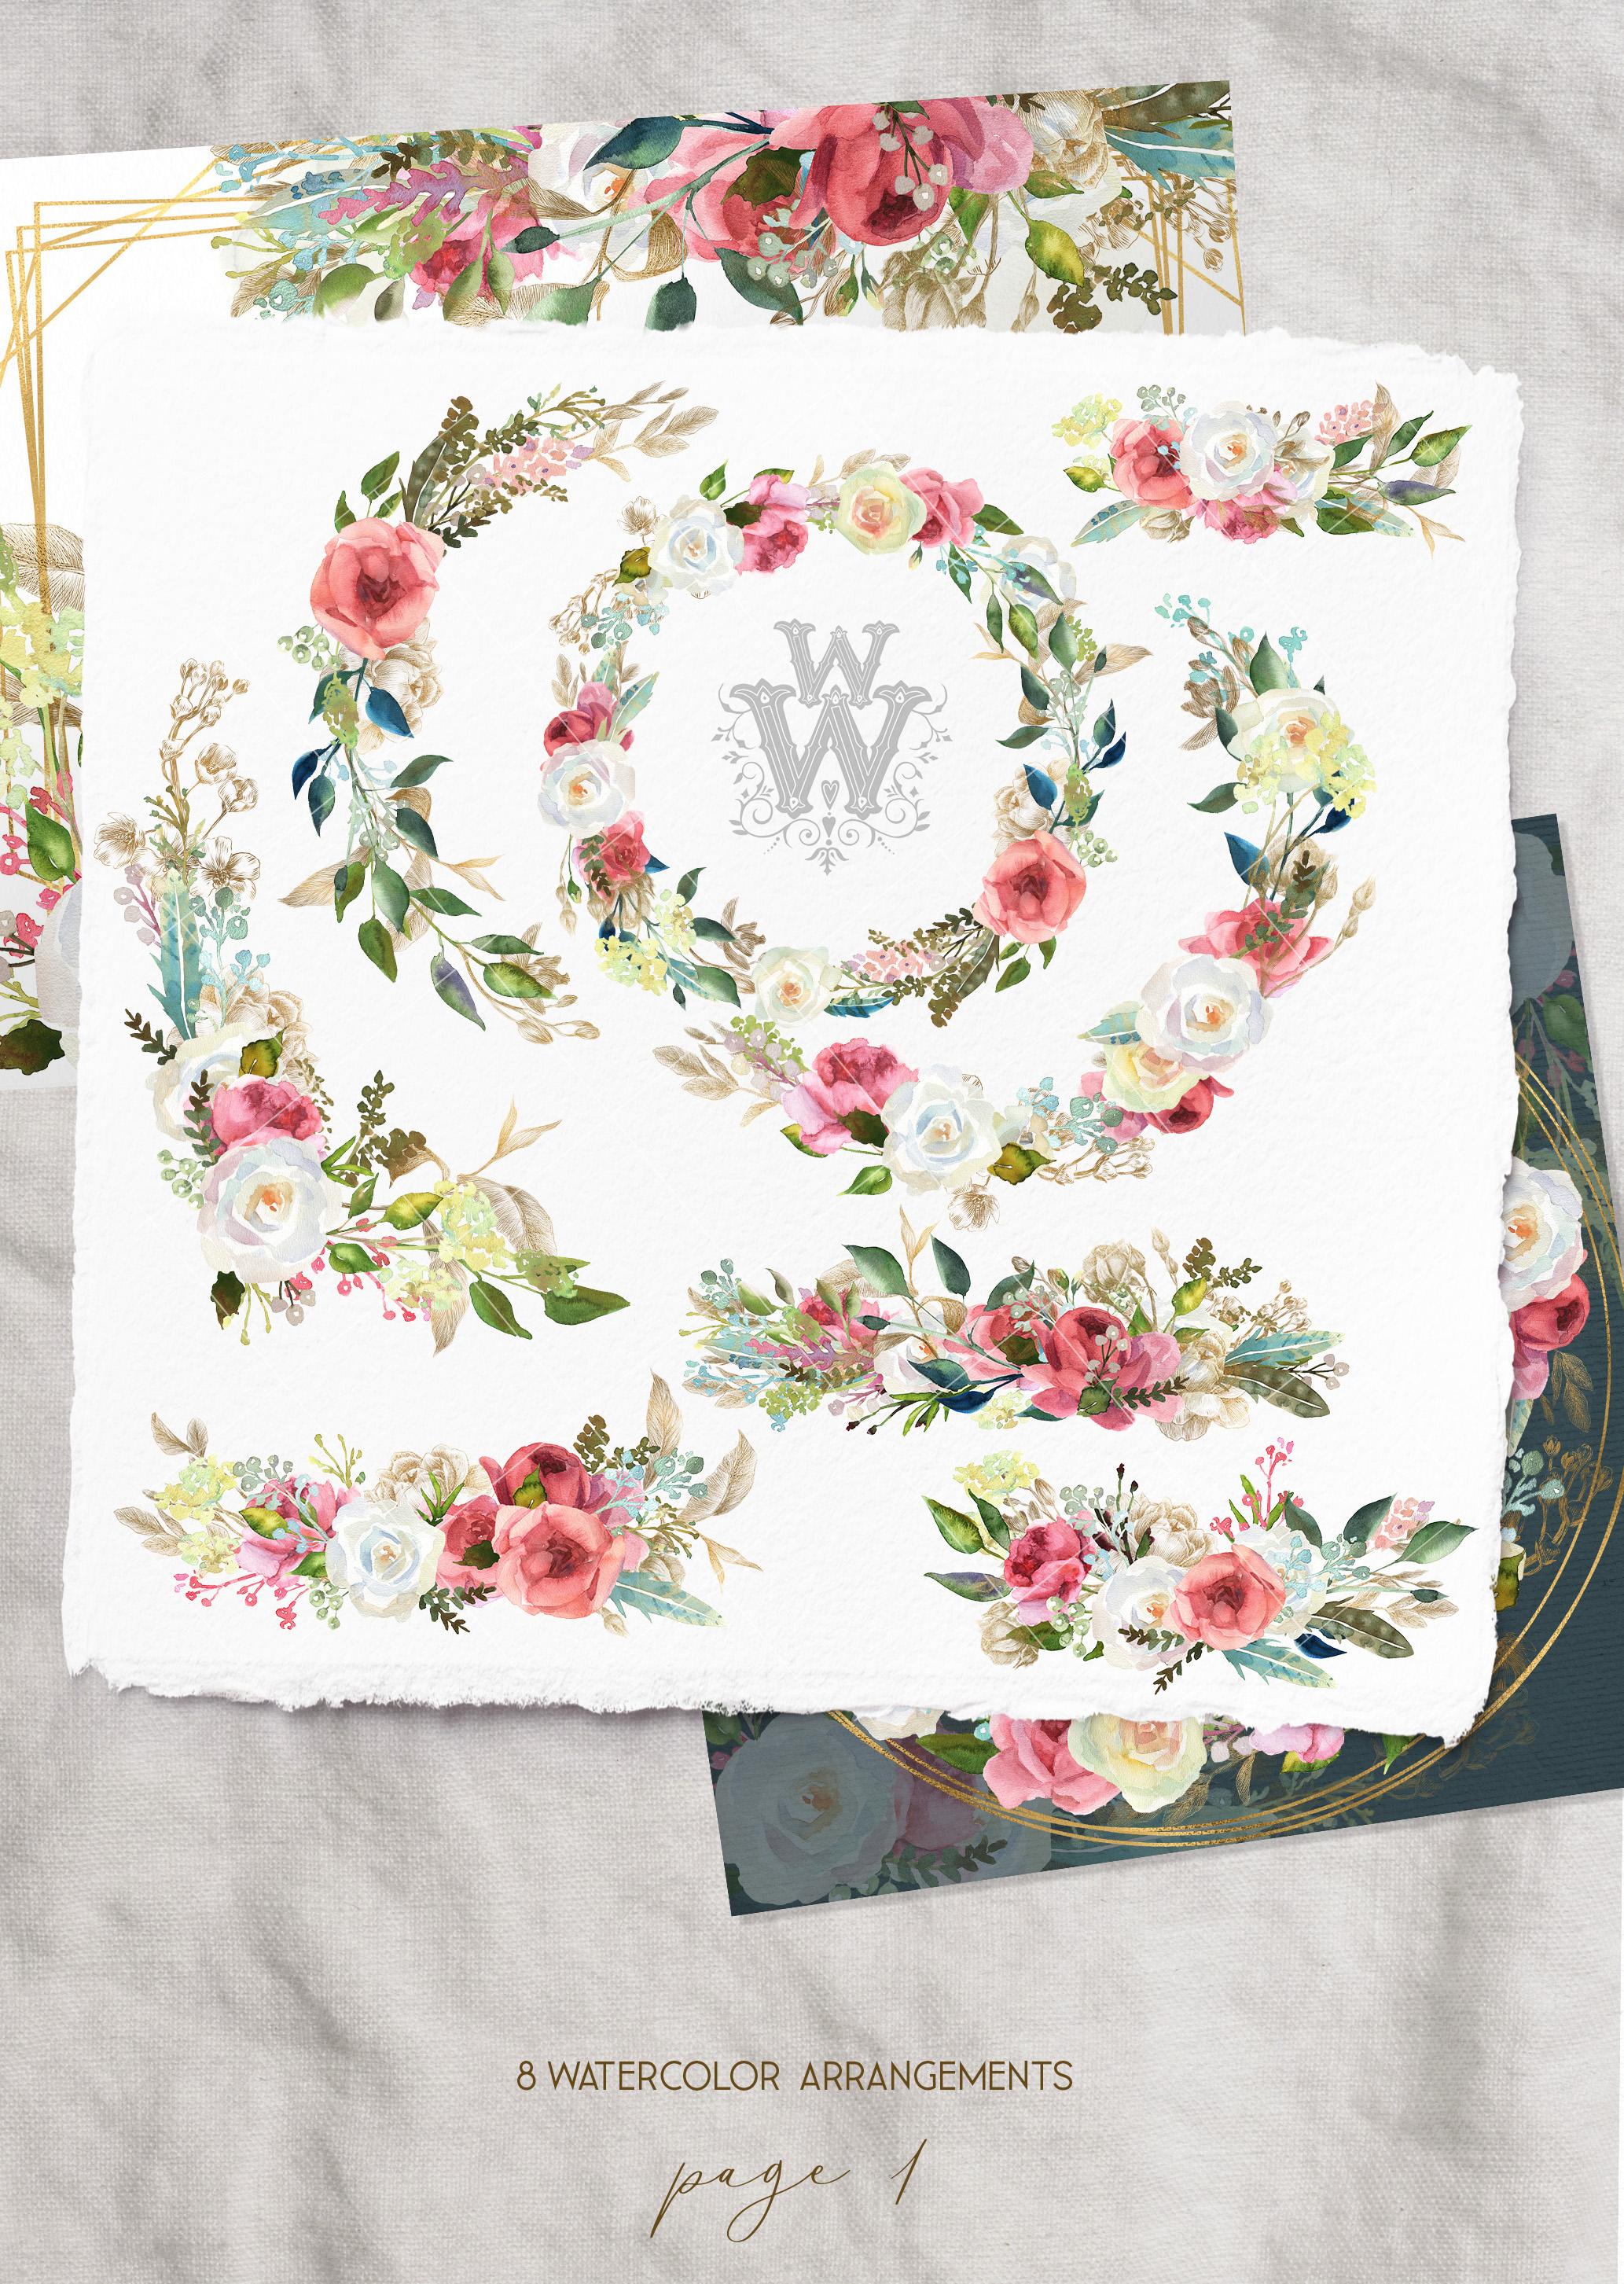 Watercolor rustic wedding bouquets clipart, vintage wreath example image 2